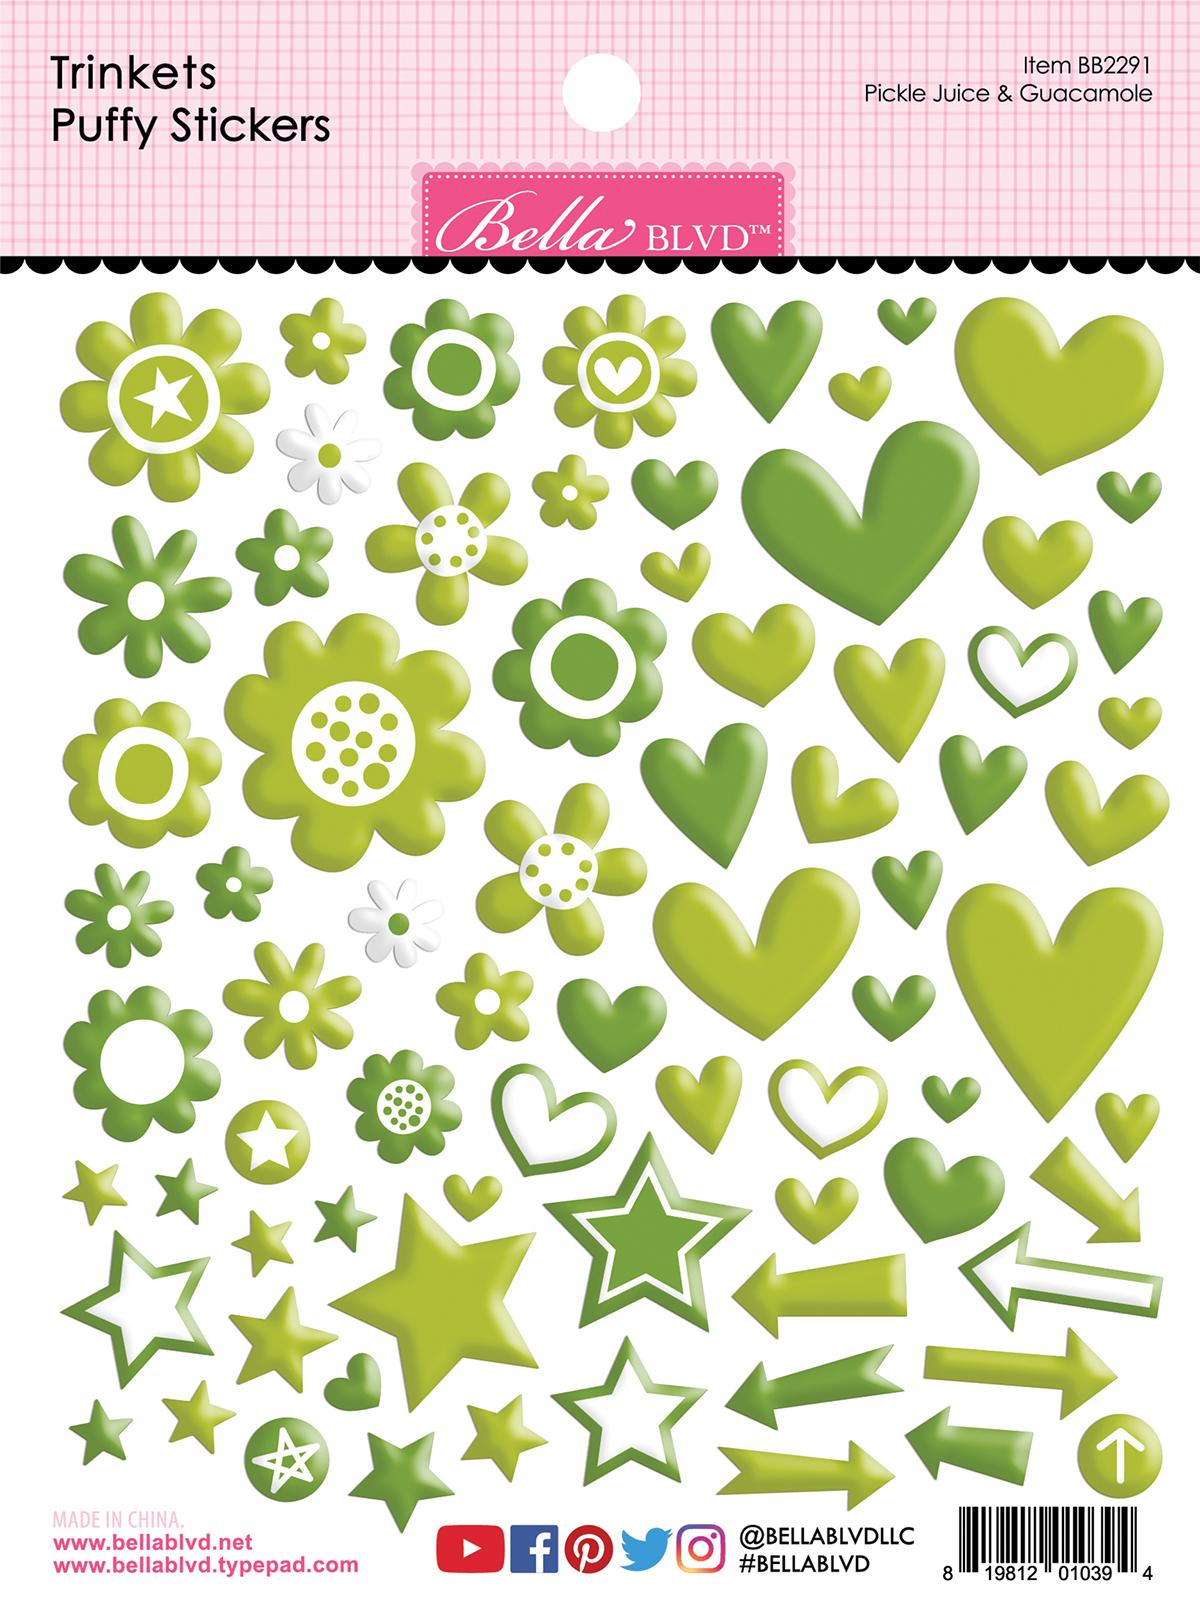 Puffy Stickers, Trinkets - Pickle Juice & Guacamole